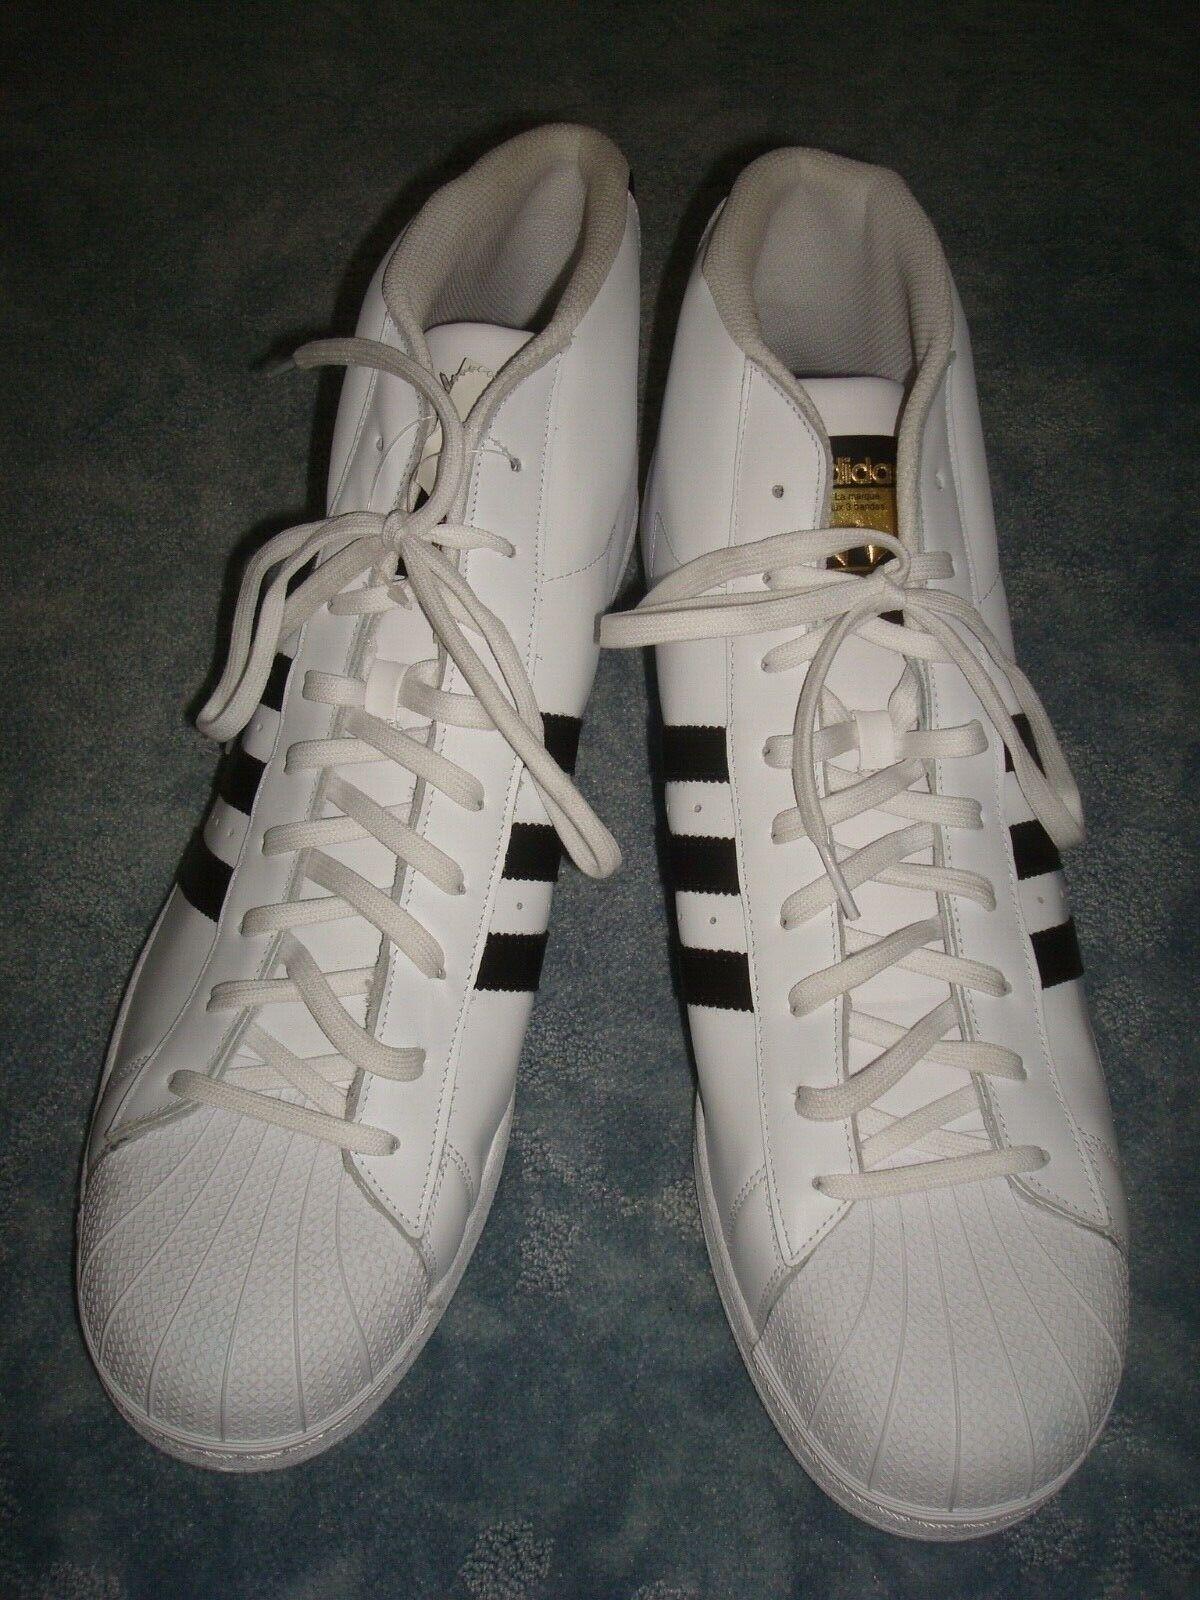 ADIDAS PRO modelo zapatillas Talla 20 US, 19 UK, 55.5 EUR